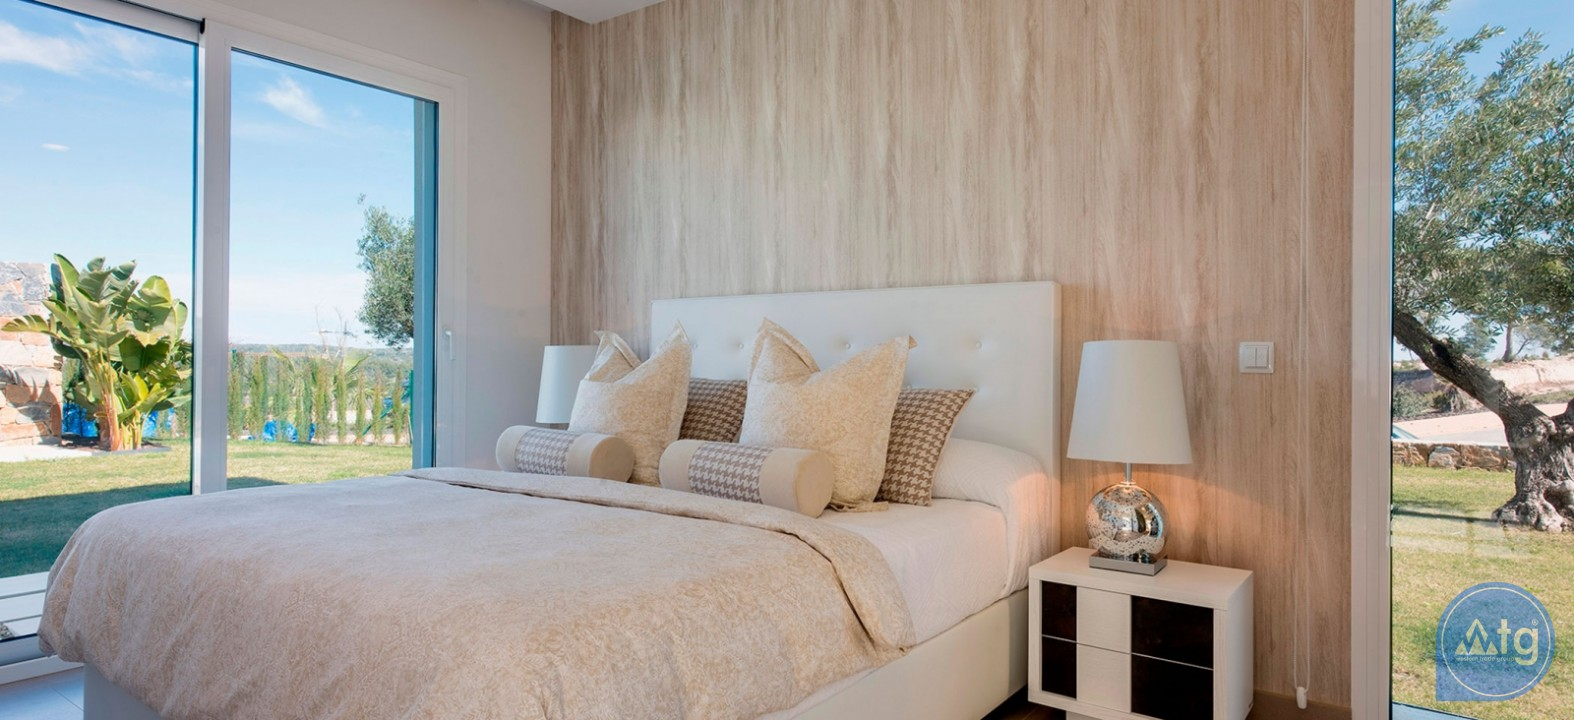 3 bedroom Bungalow in Pilar de la Horadada - SR2619 - 6